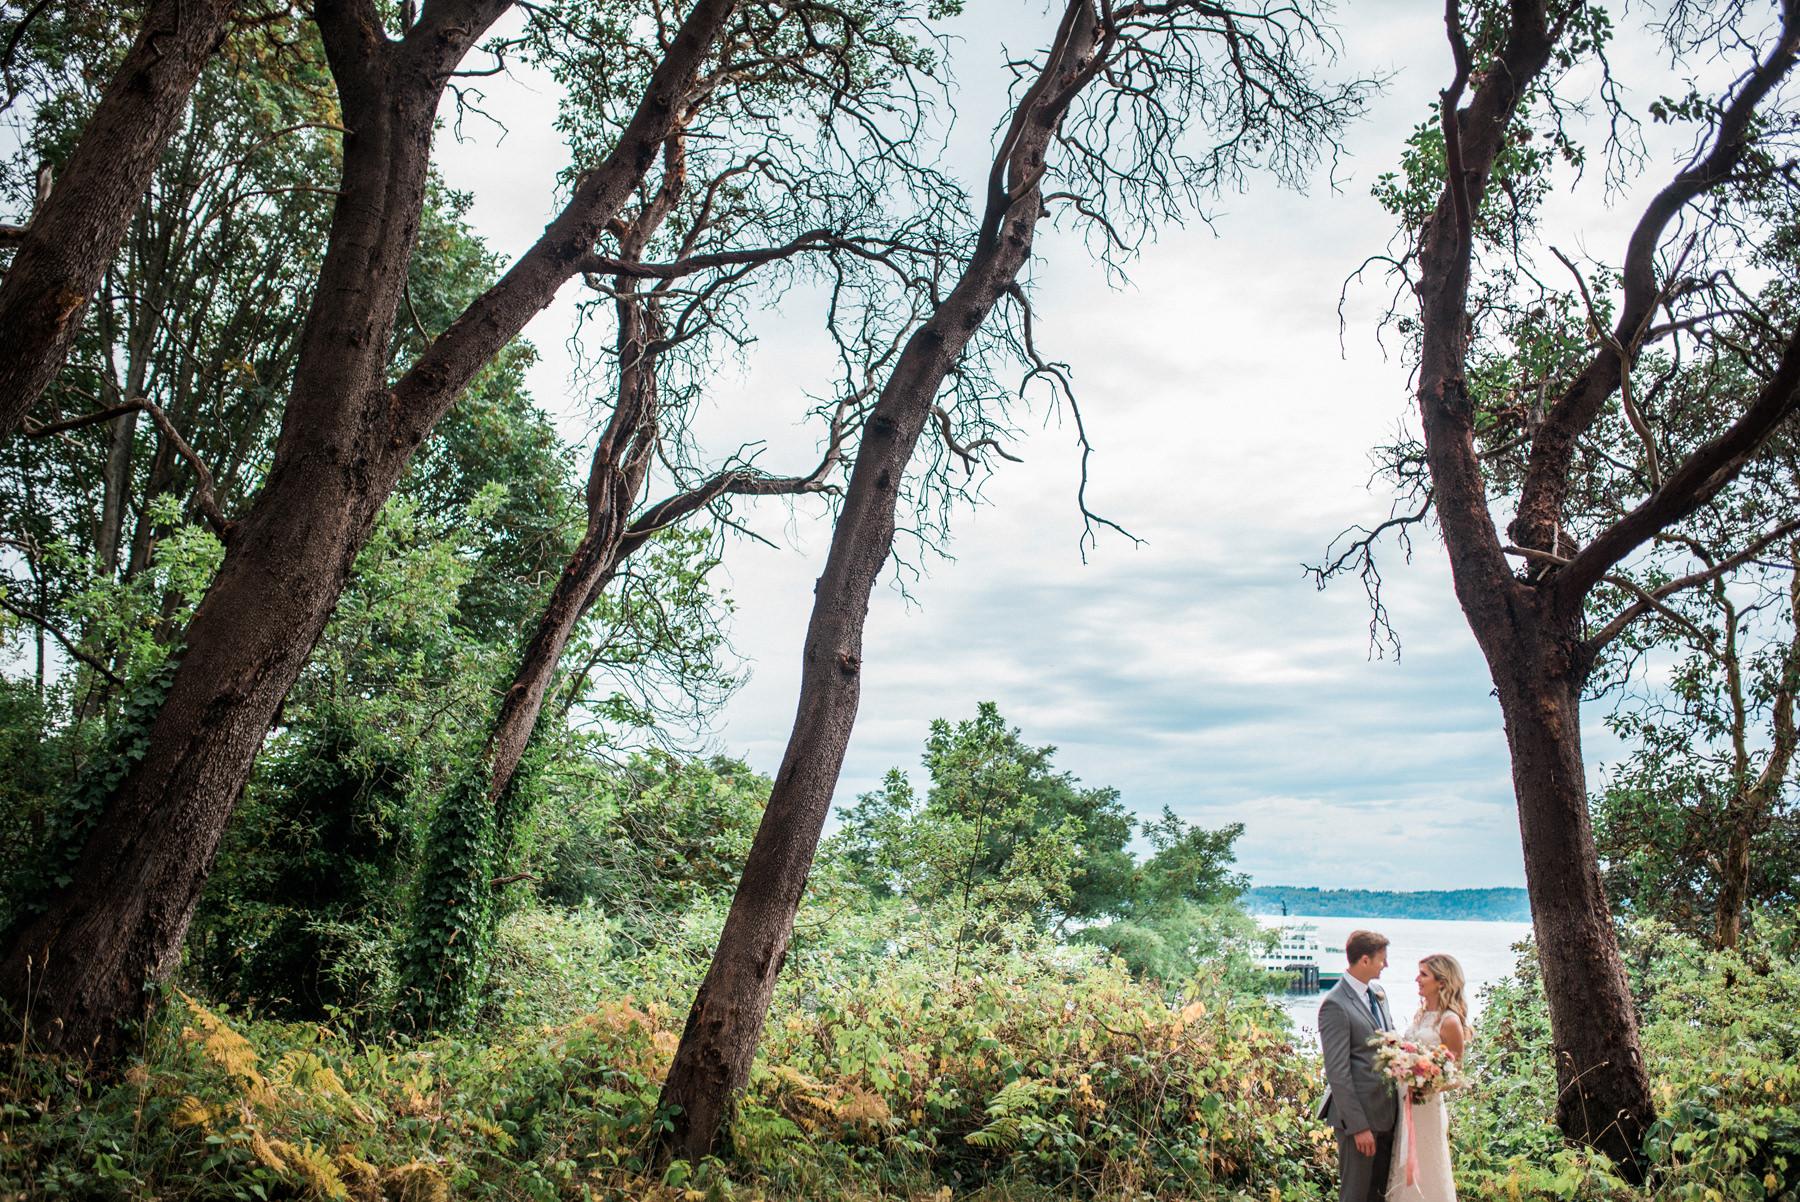 185-fine-art-wedding-portraits-on-kodak-film-at-lincoln-park-in-west-seattle.jpg